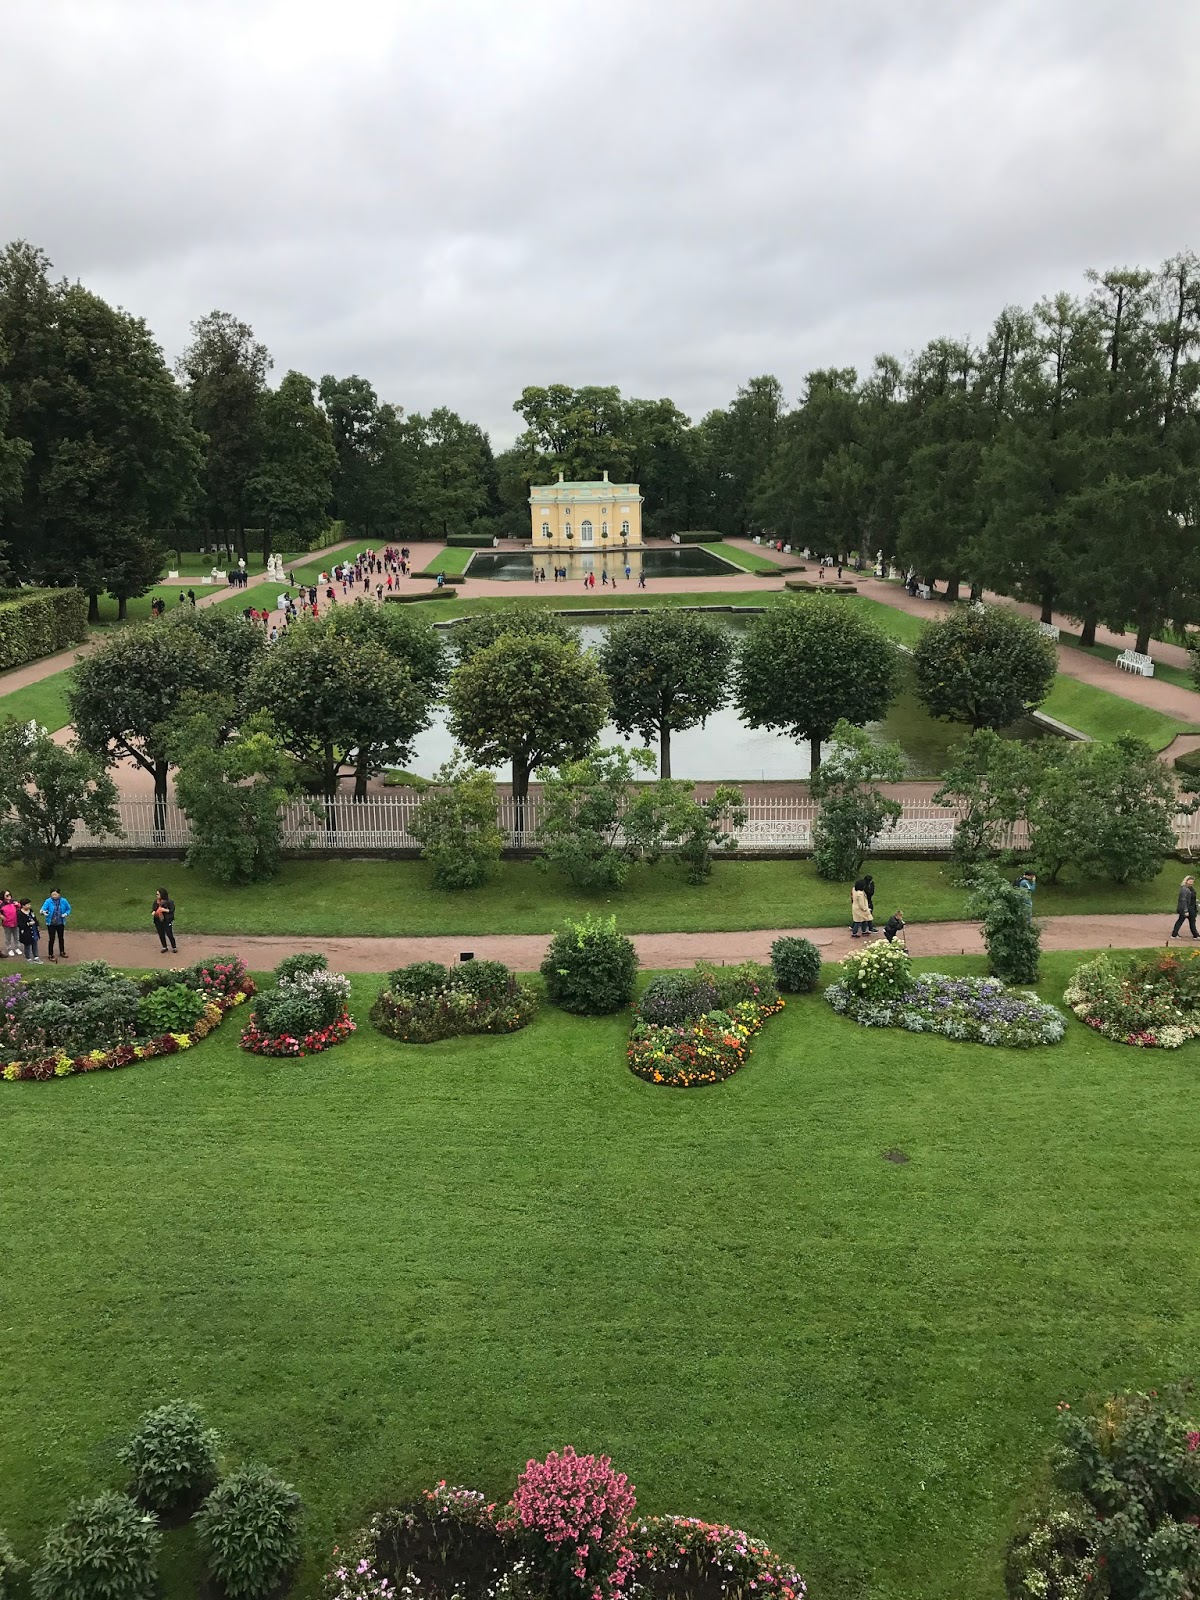 Cameron Gallery - Catherine Palace